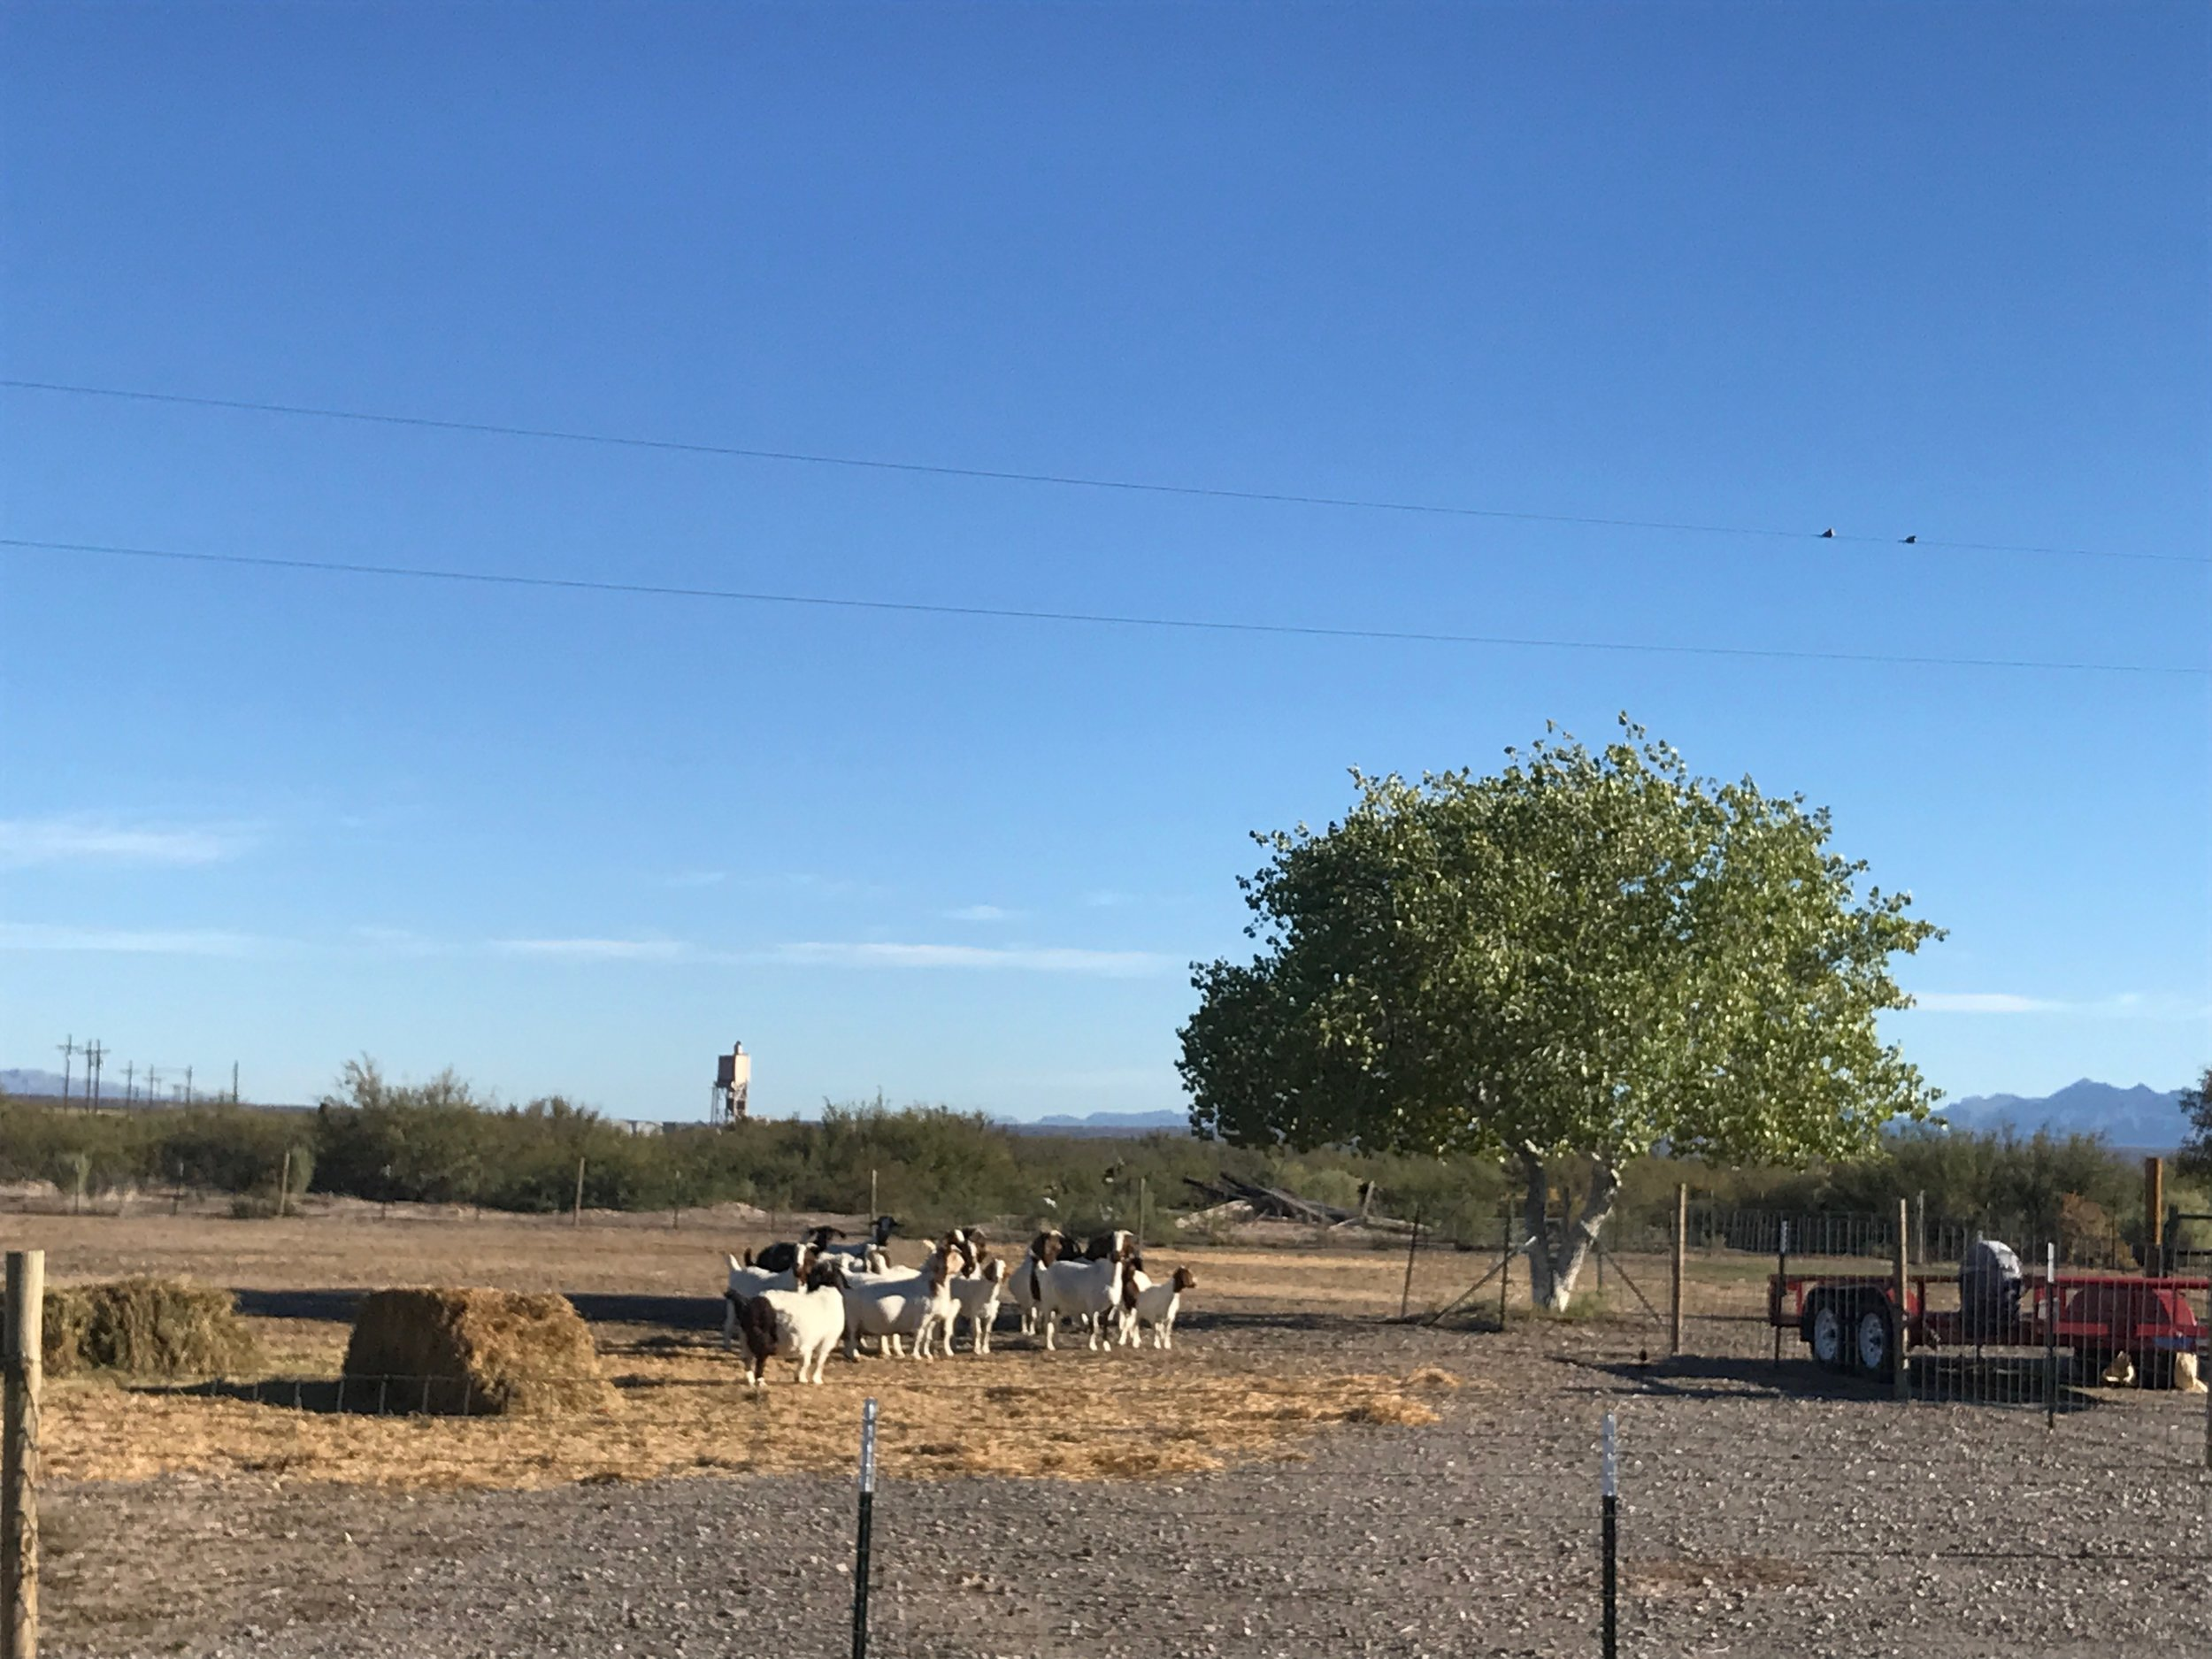 The sheriffs goats.